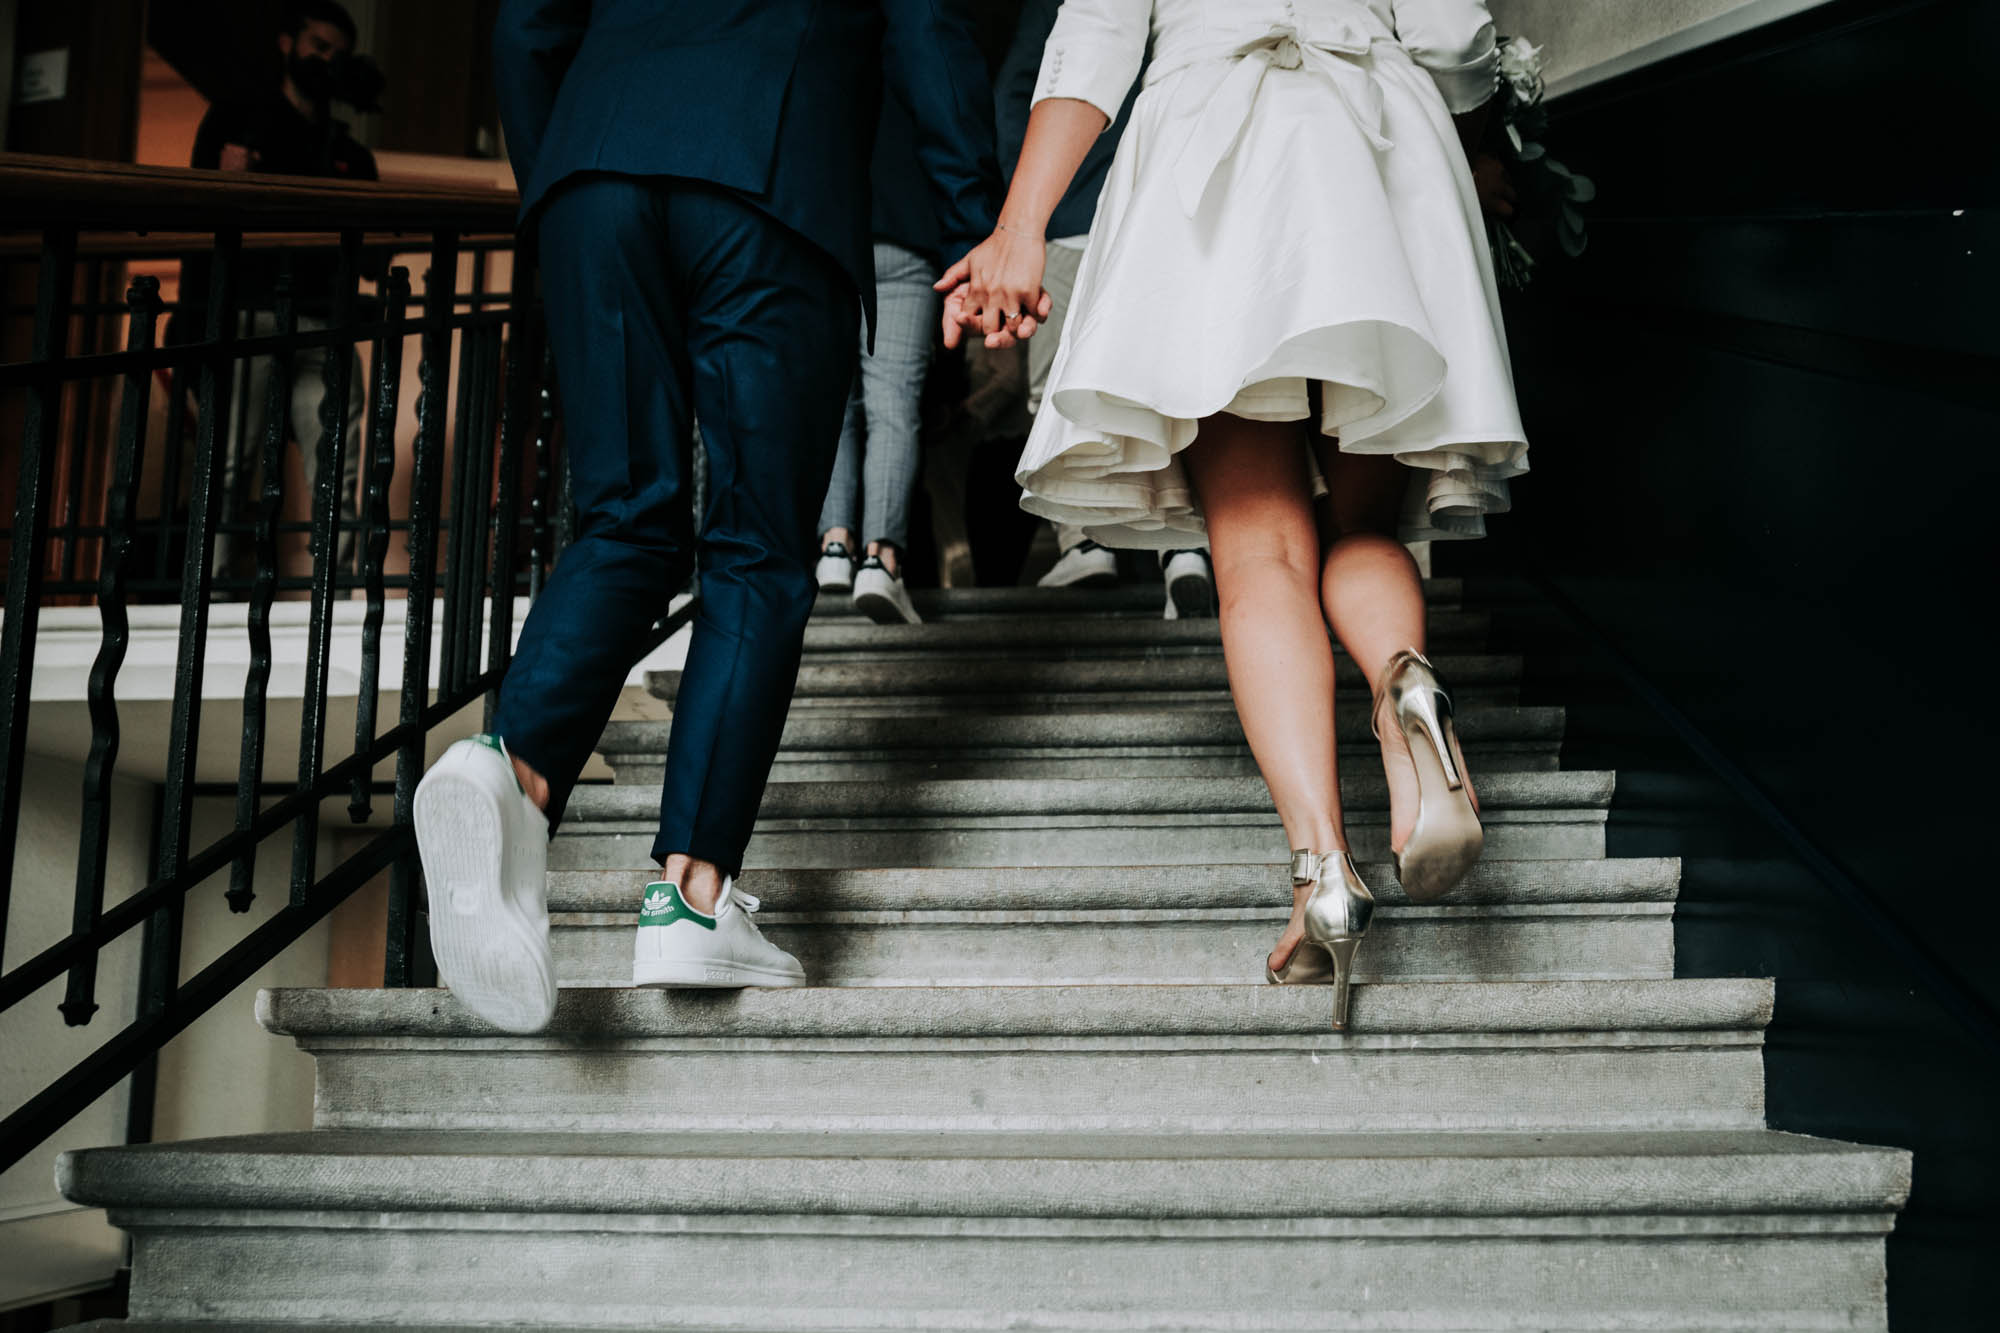 2018-07-21 - LD8_8859 - photographe mariage lyon - laurie diaz - www.lauriediazweeding.com.jpg